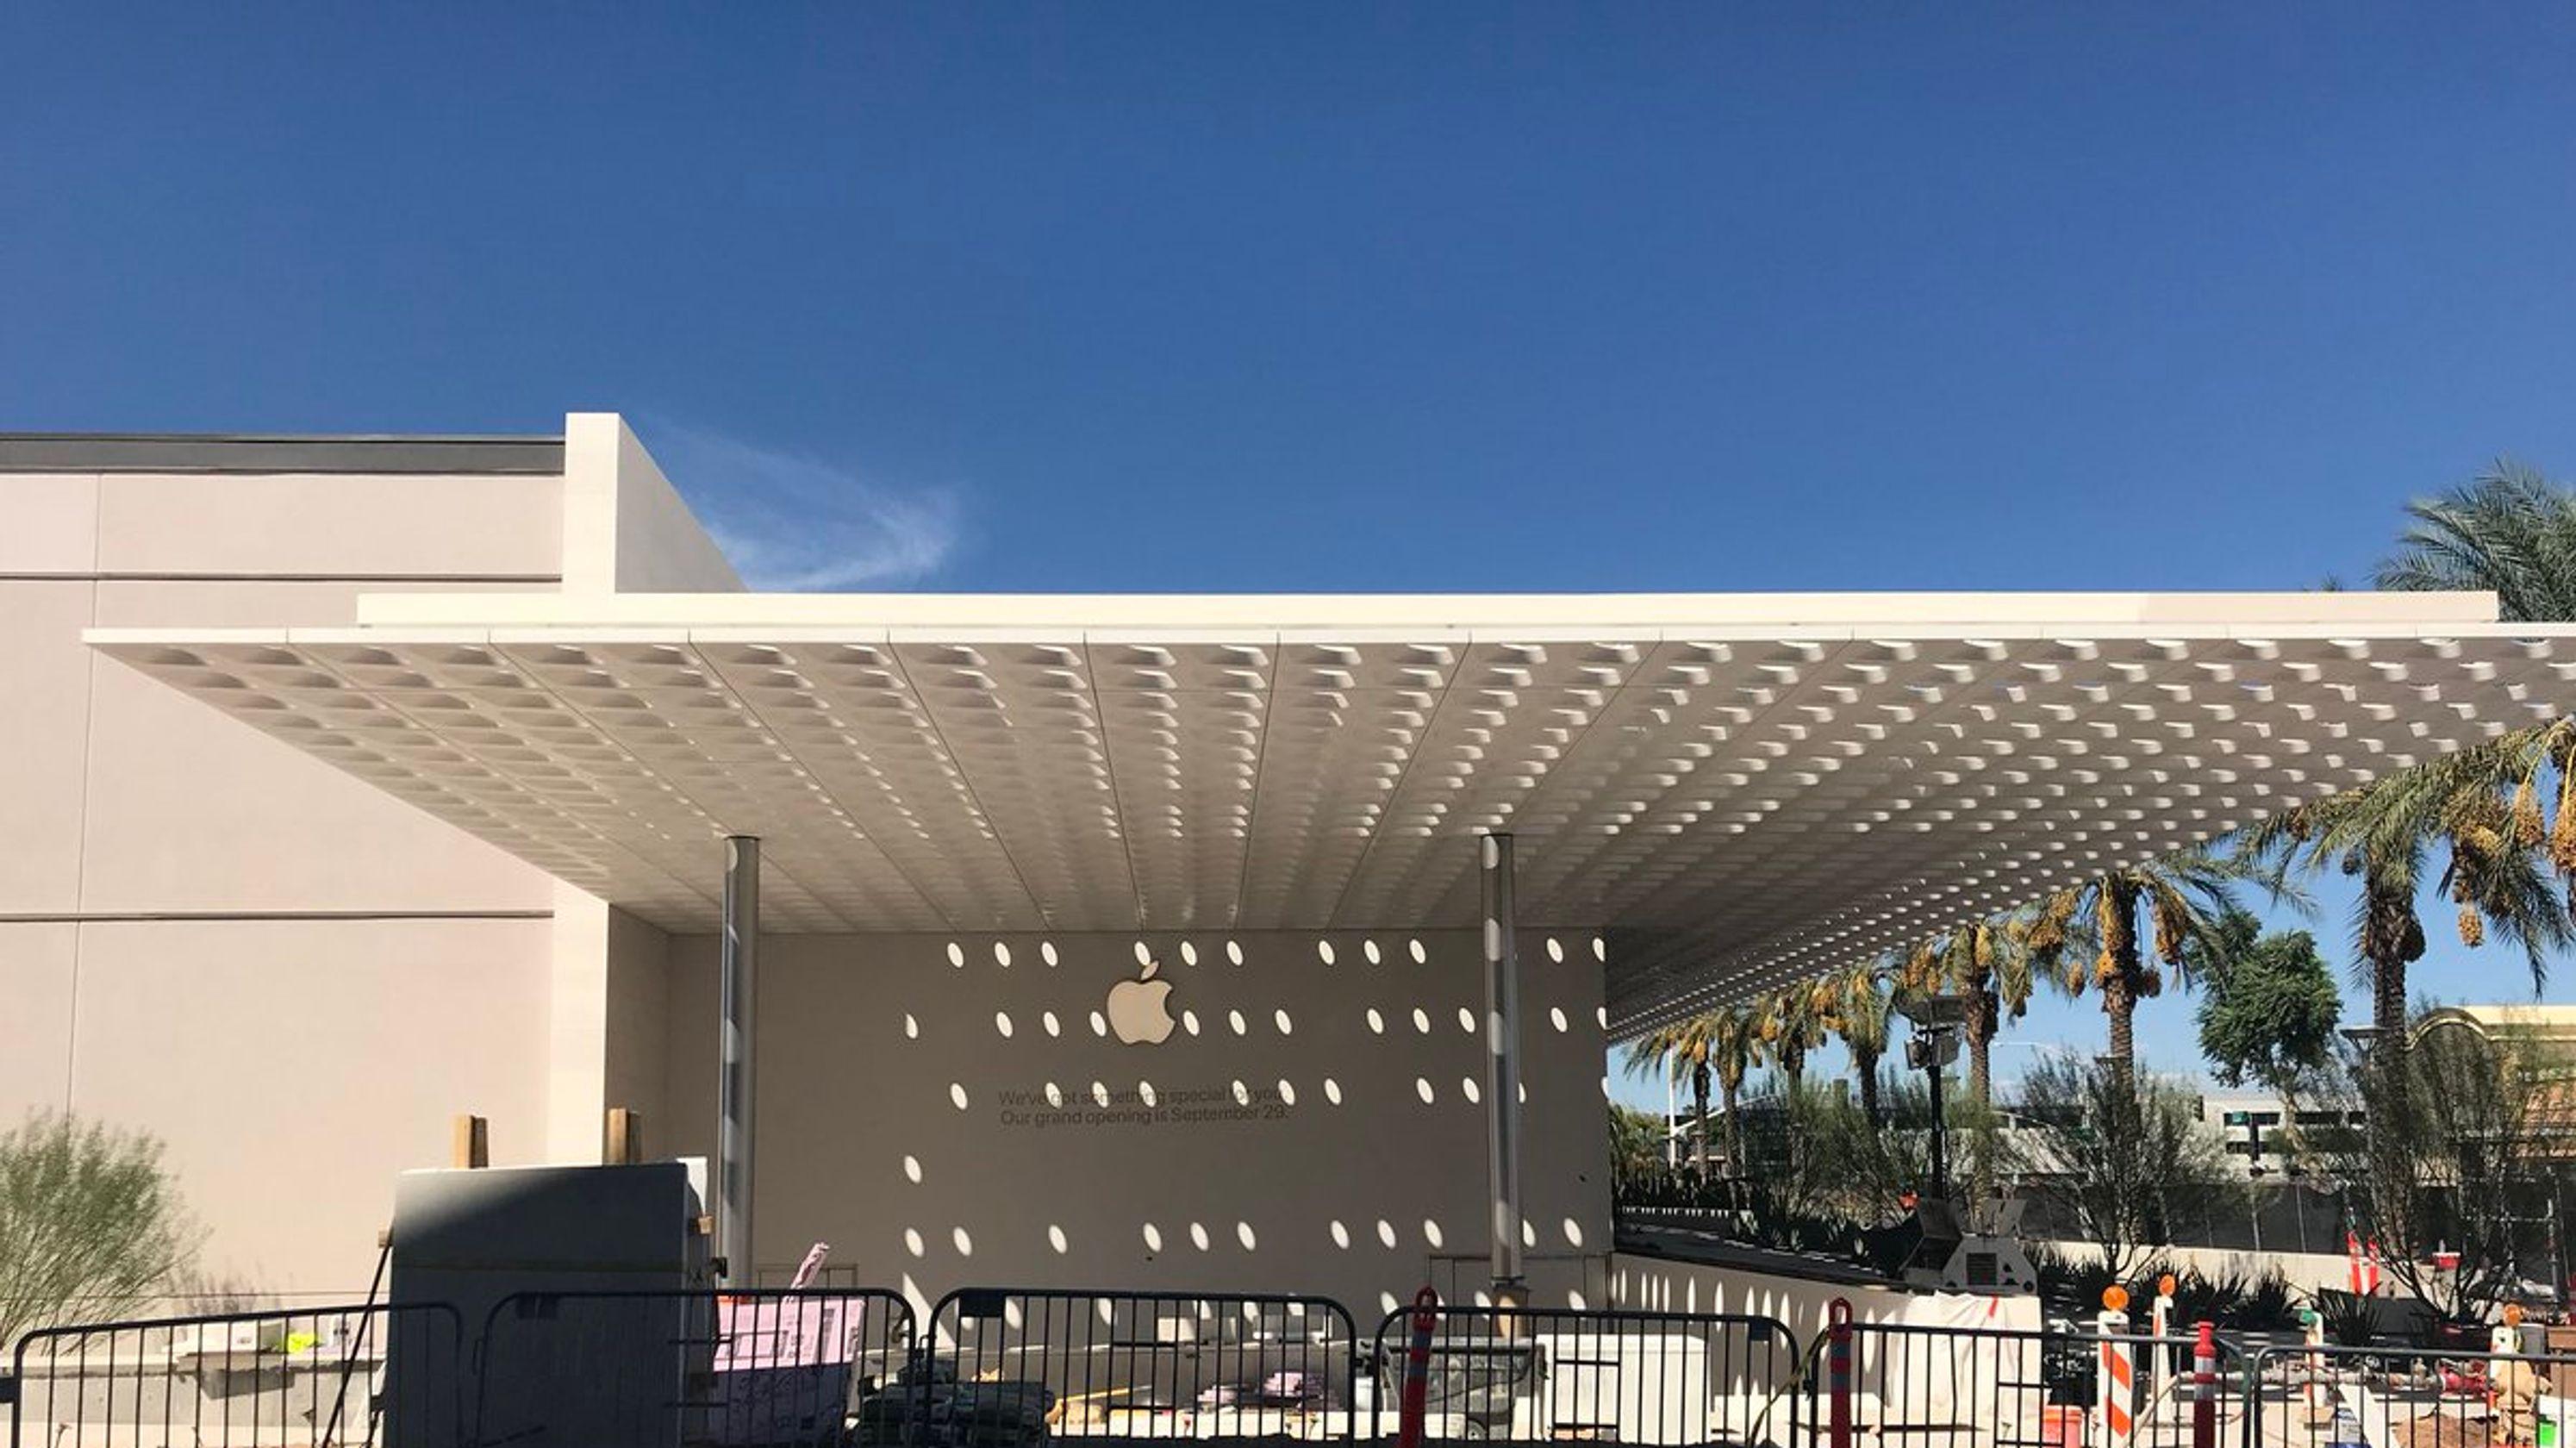 Apple store exterior